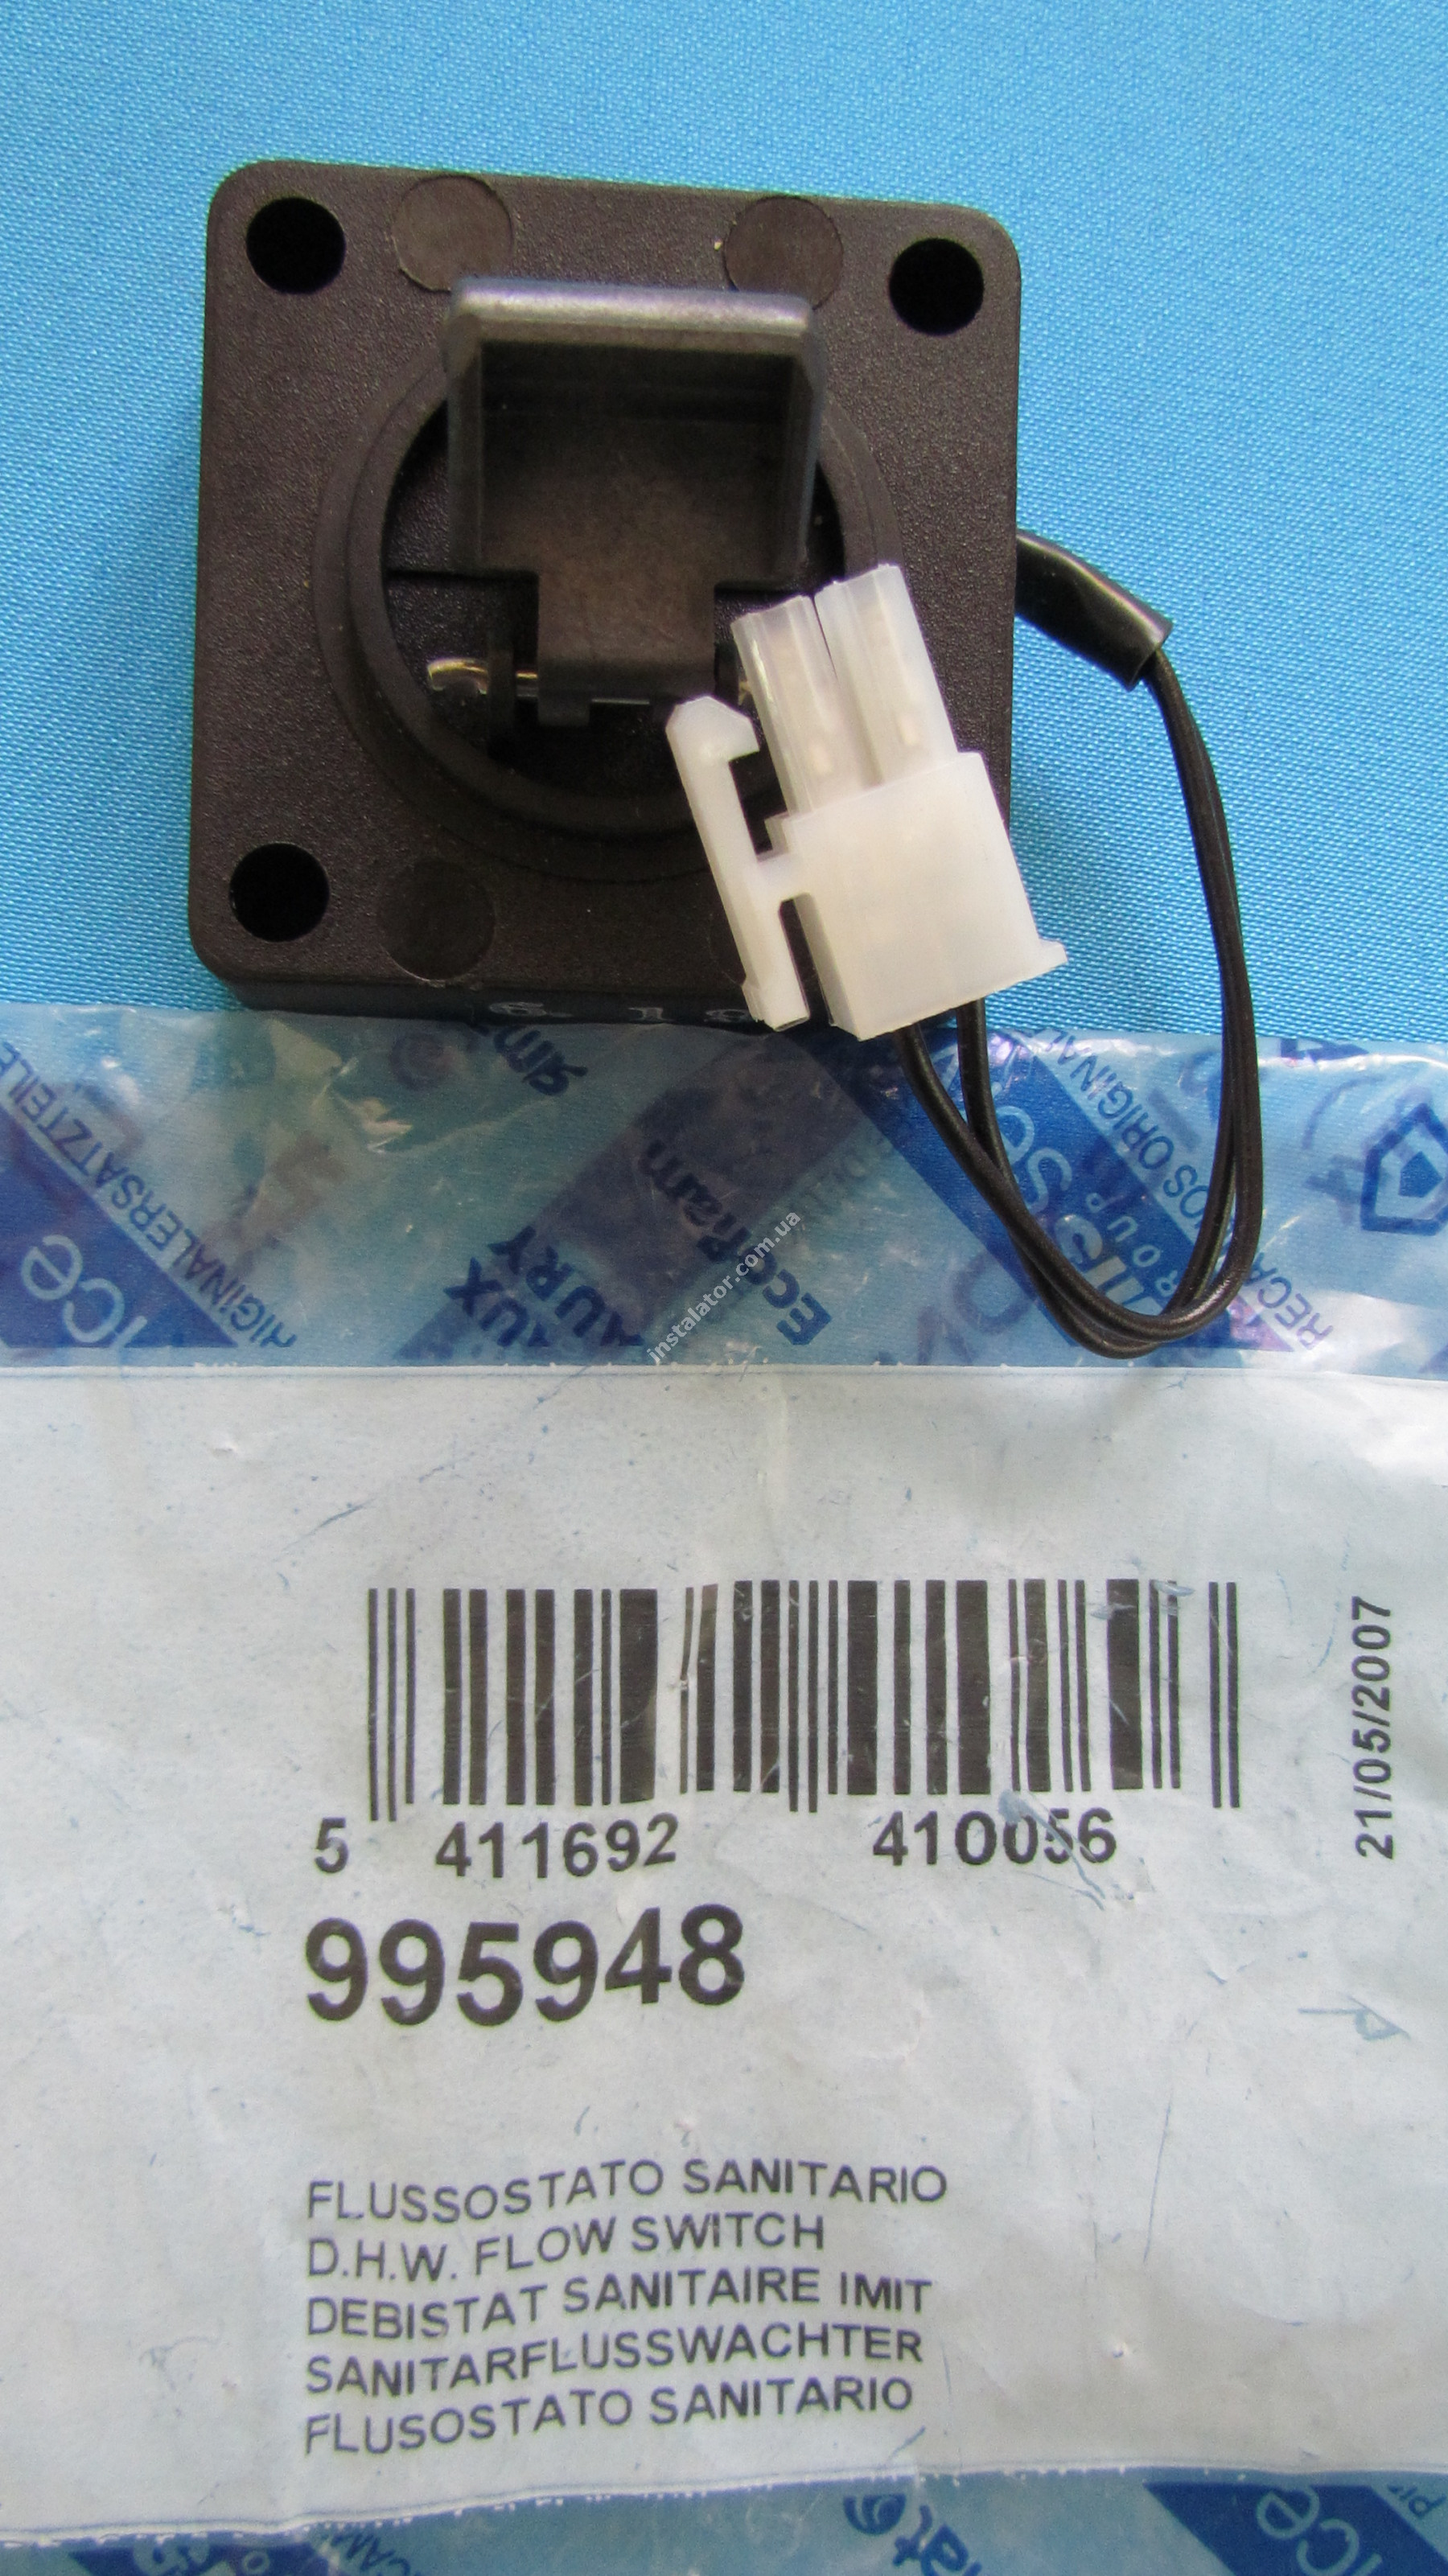 995948 Датчик протоку ГВП ARISTON Uno full-image-1